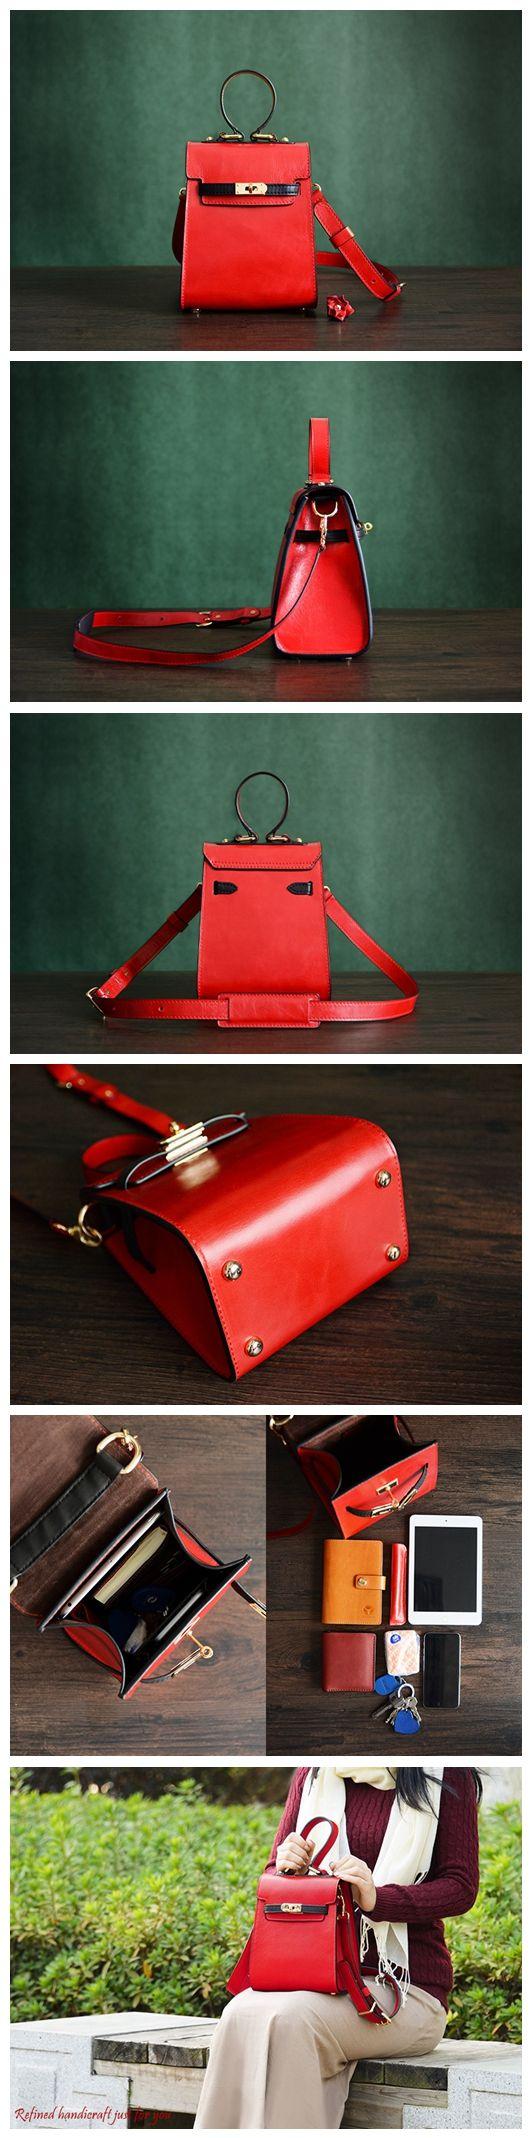 Custom Handmade Italian Vegetable Tan Brown Leather Satchel Bag, Messenger Shoulder Bag